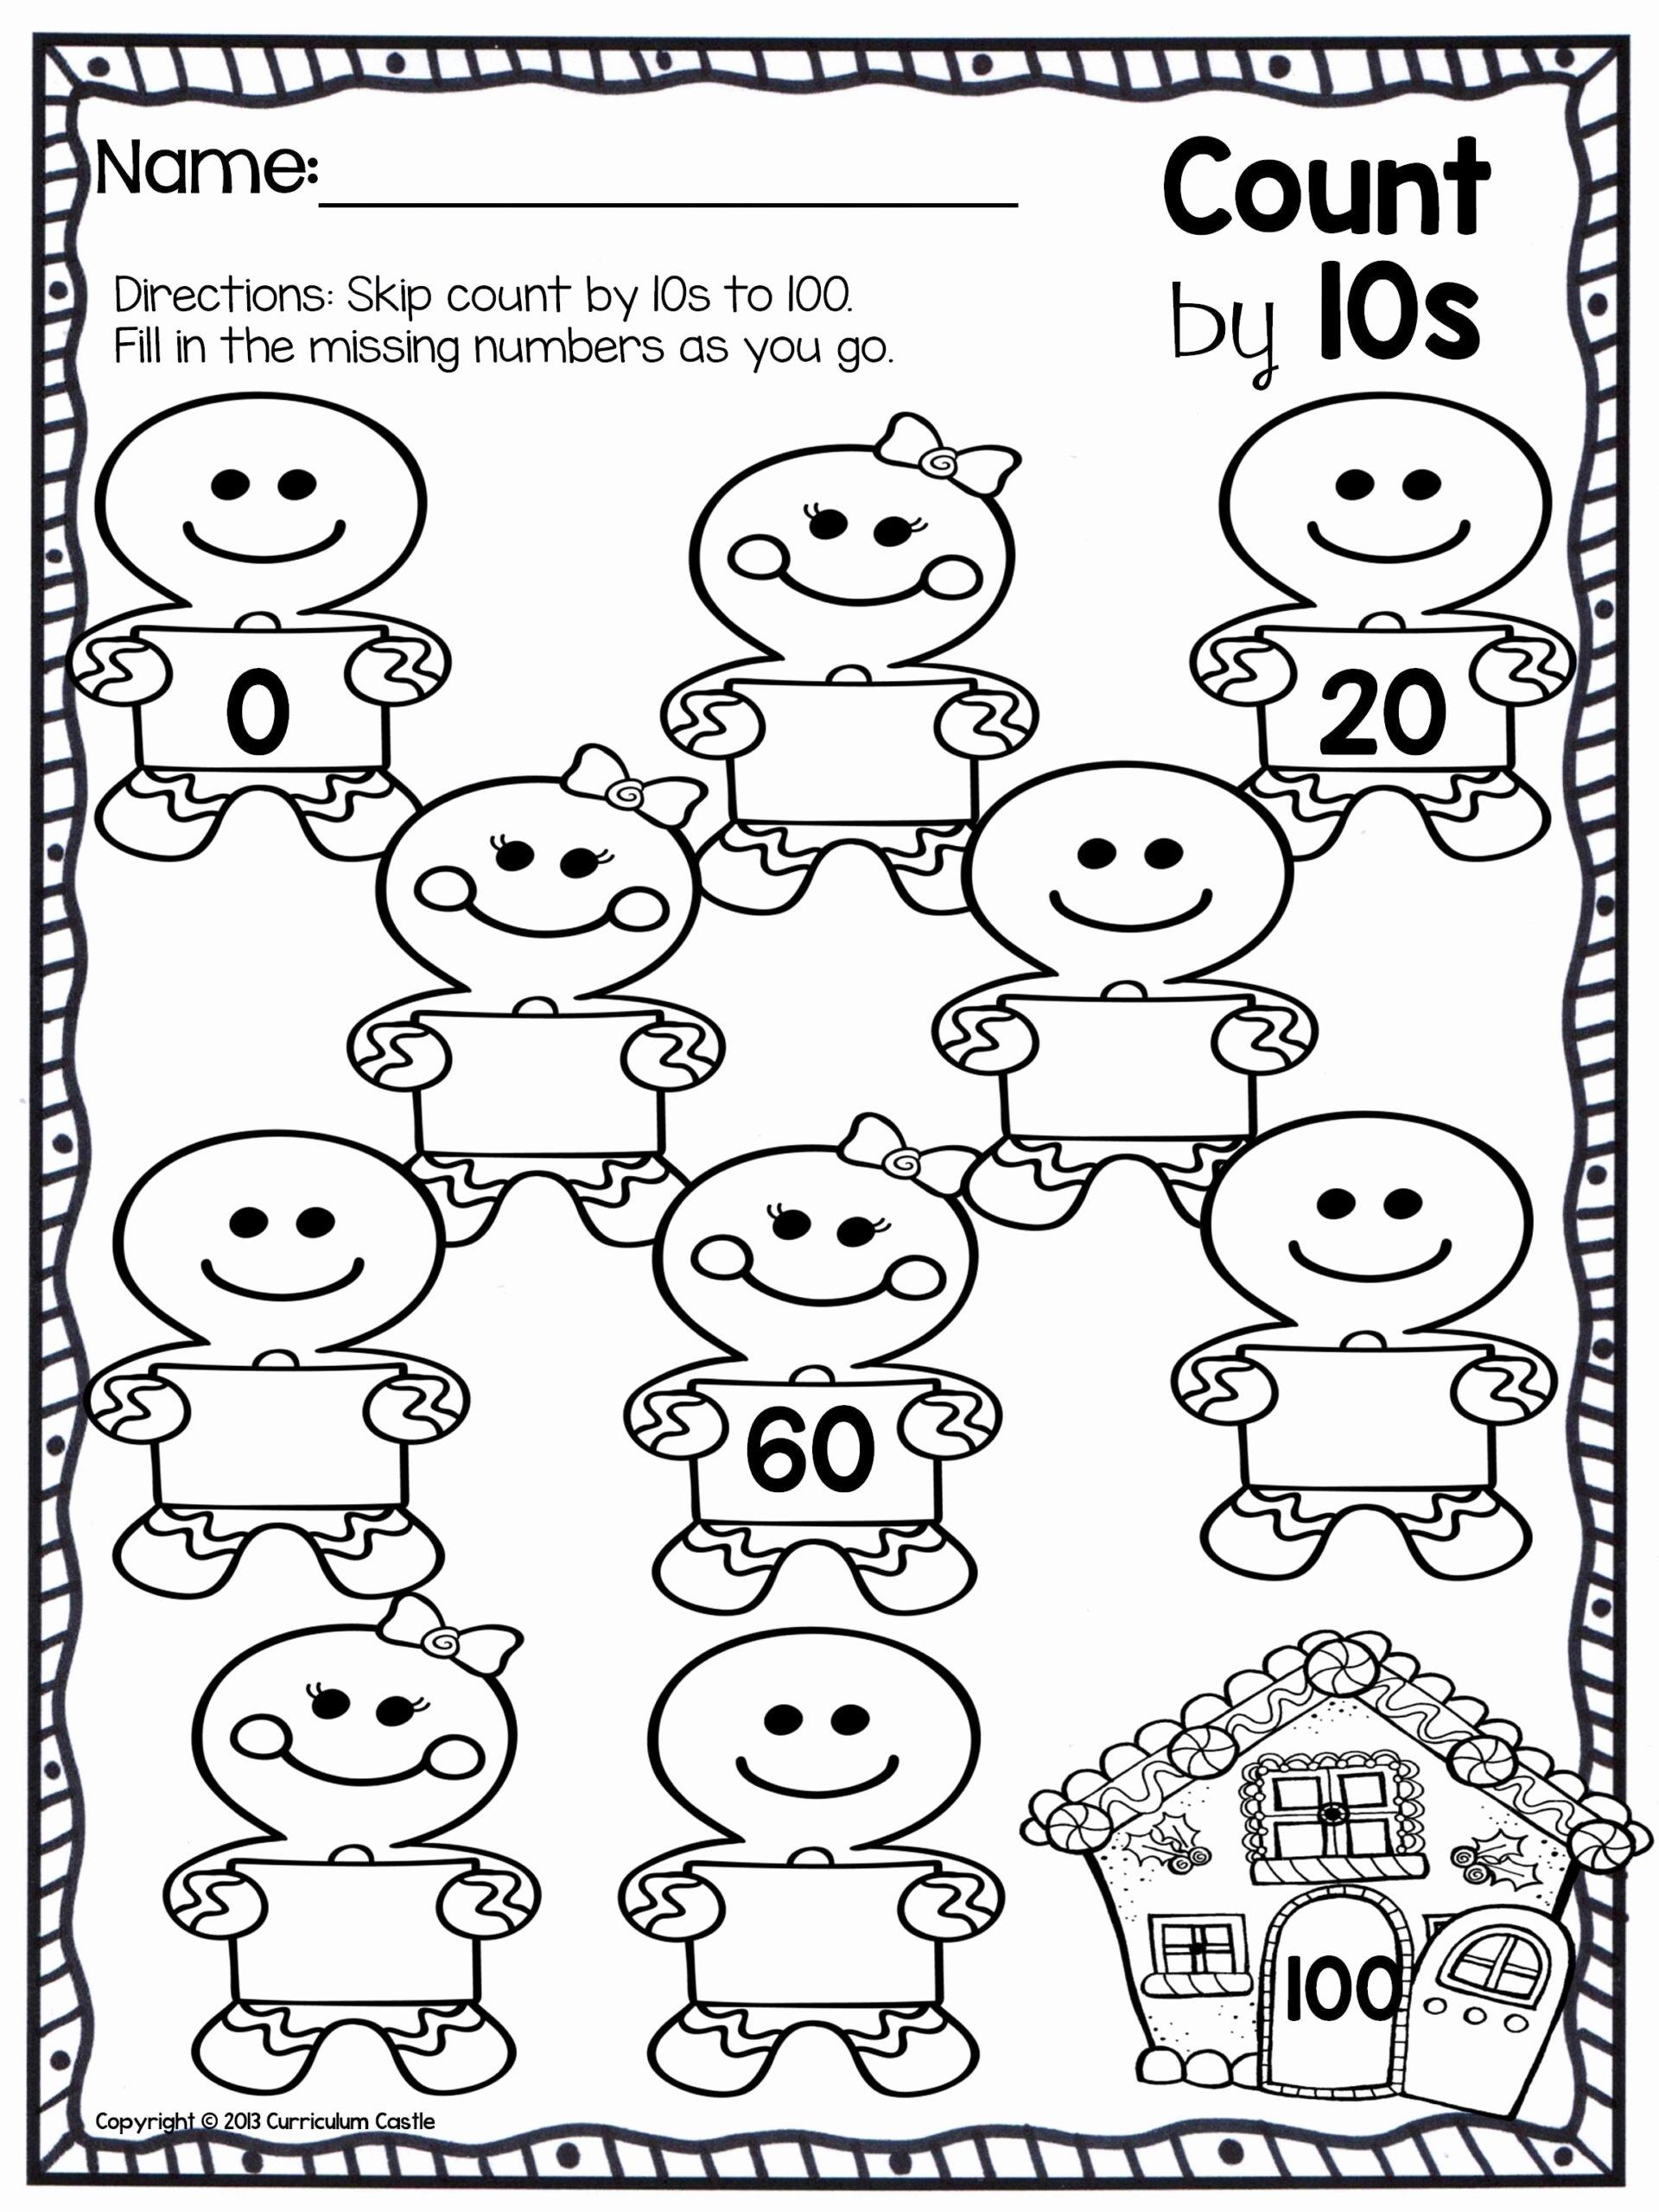 Number Worksheets for Preschoolers top Christmas Counting Worksheets Printable and – Kingandsullivan